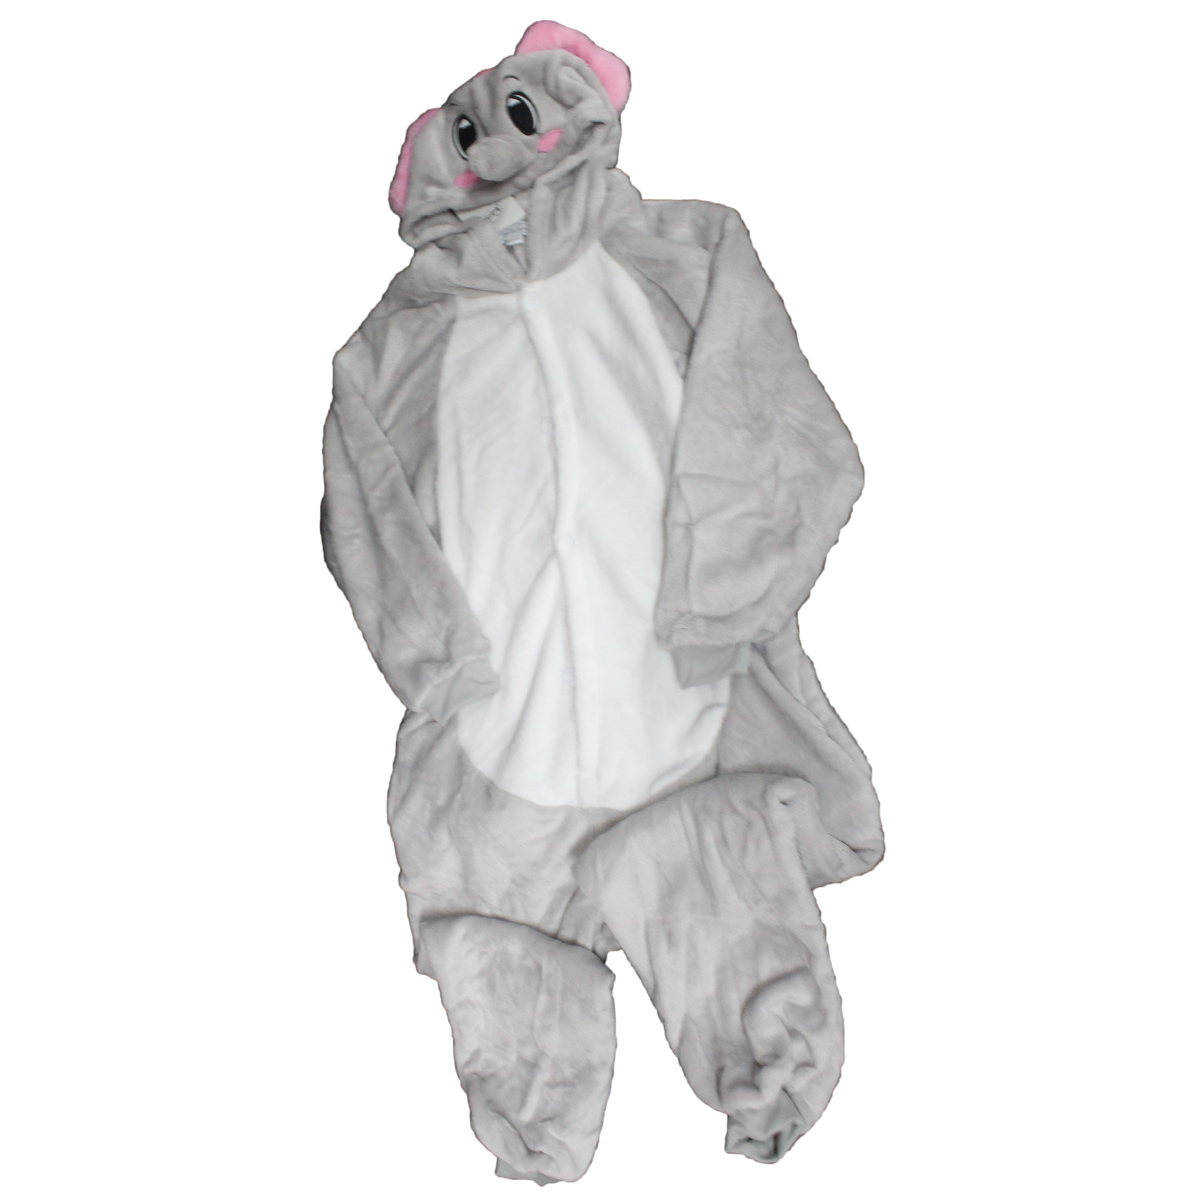 Tuta-Pigiama-Costume-Onesie-Carnevale-Halloween-Bimbo-Bimba-Unisex-Elefante